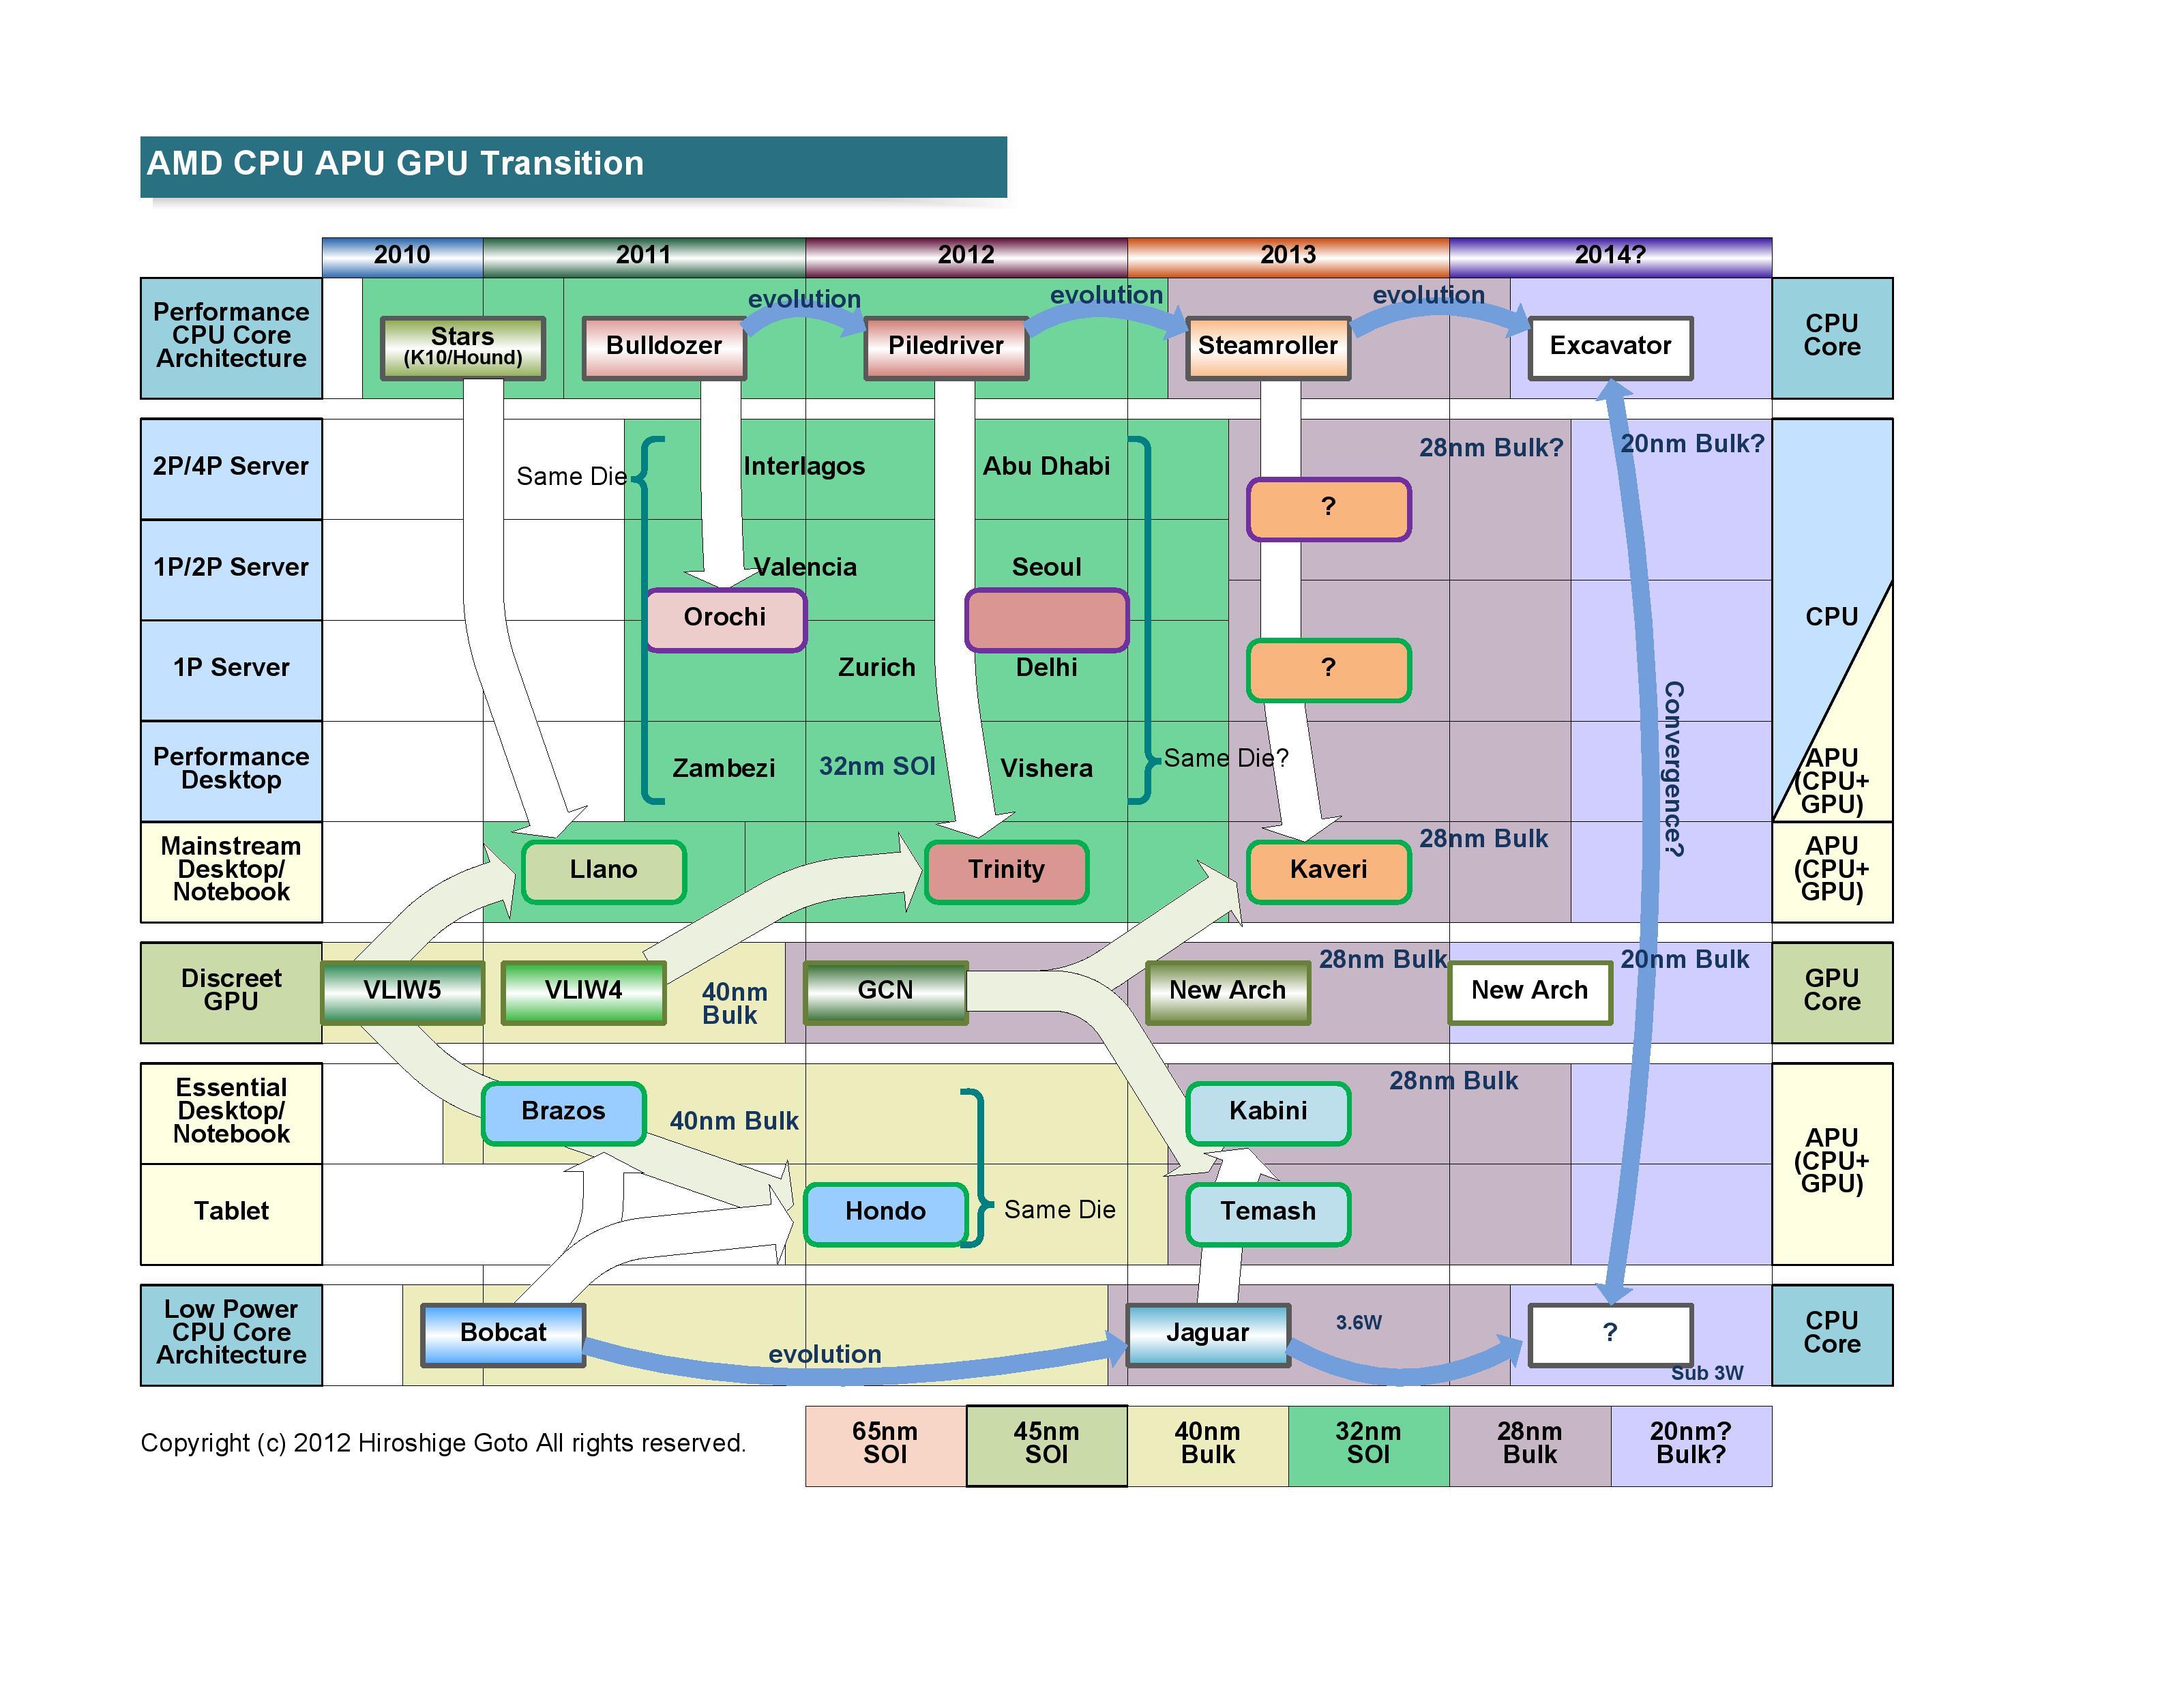 "CPUアーキテクチャの推移<br>PDF版は<a href=""/video/pcw/docs/556/374/p1.pdf"">こちら</a>"